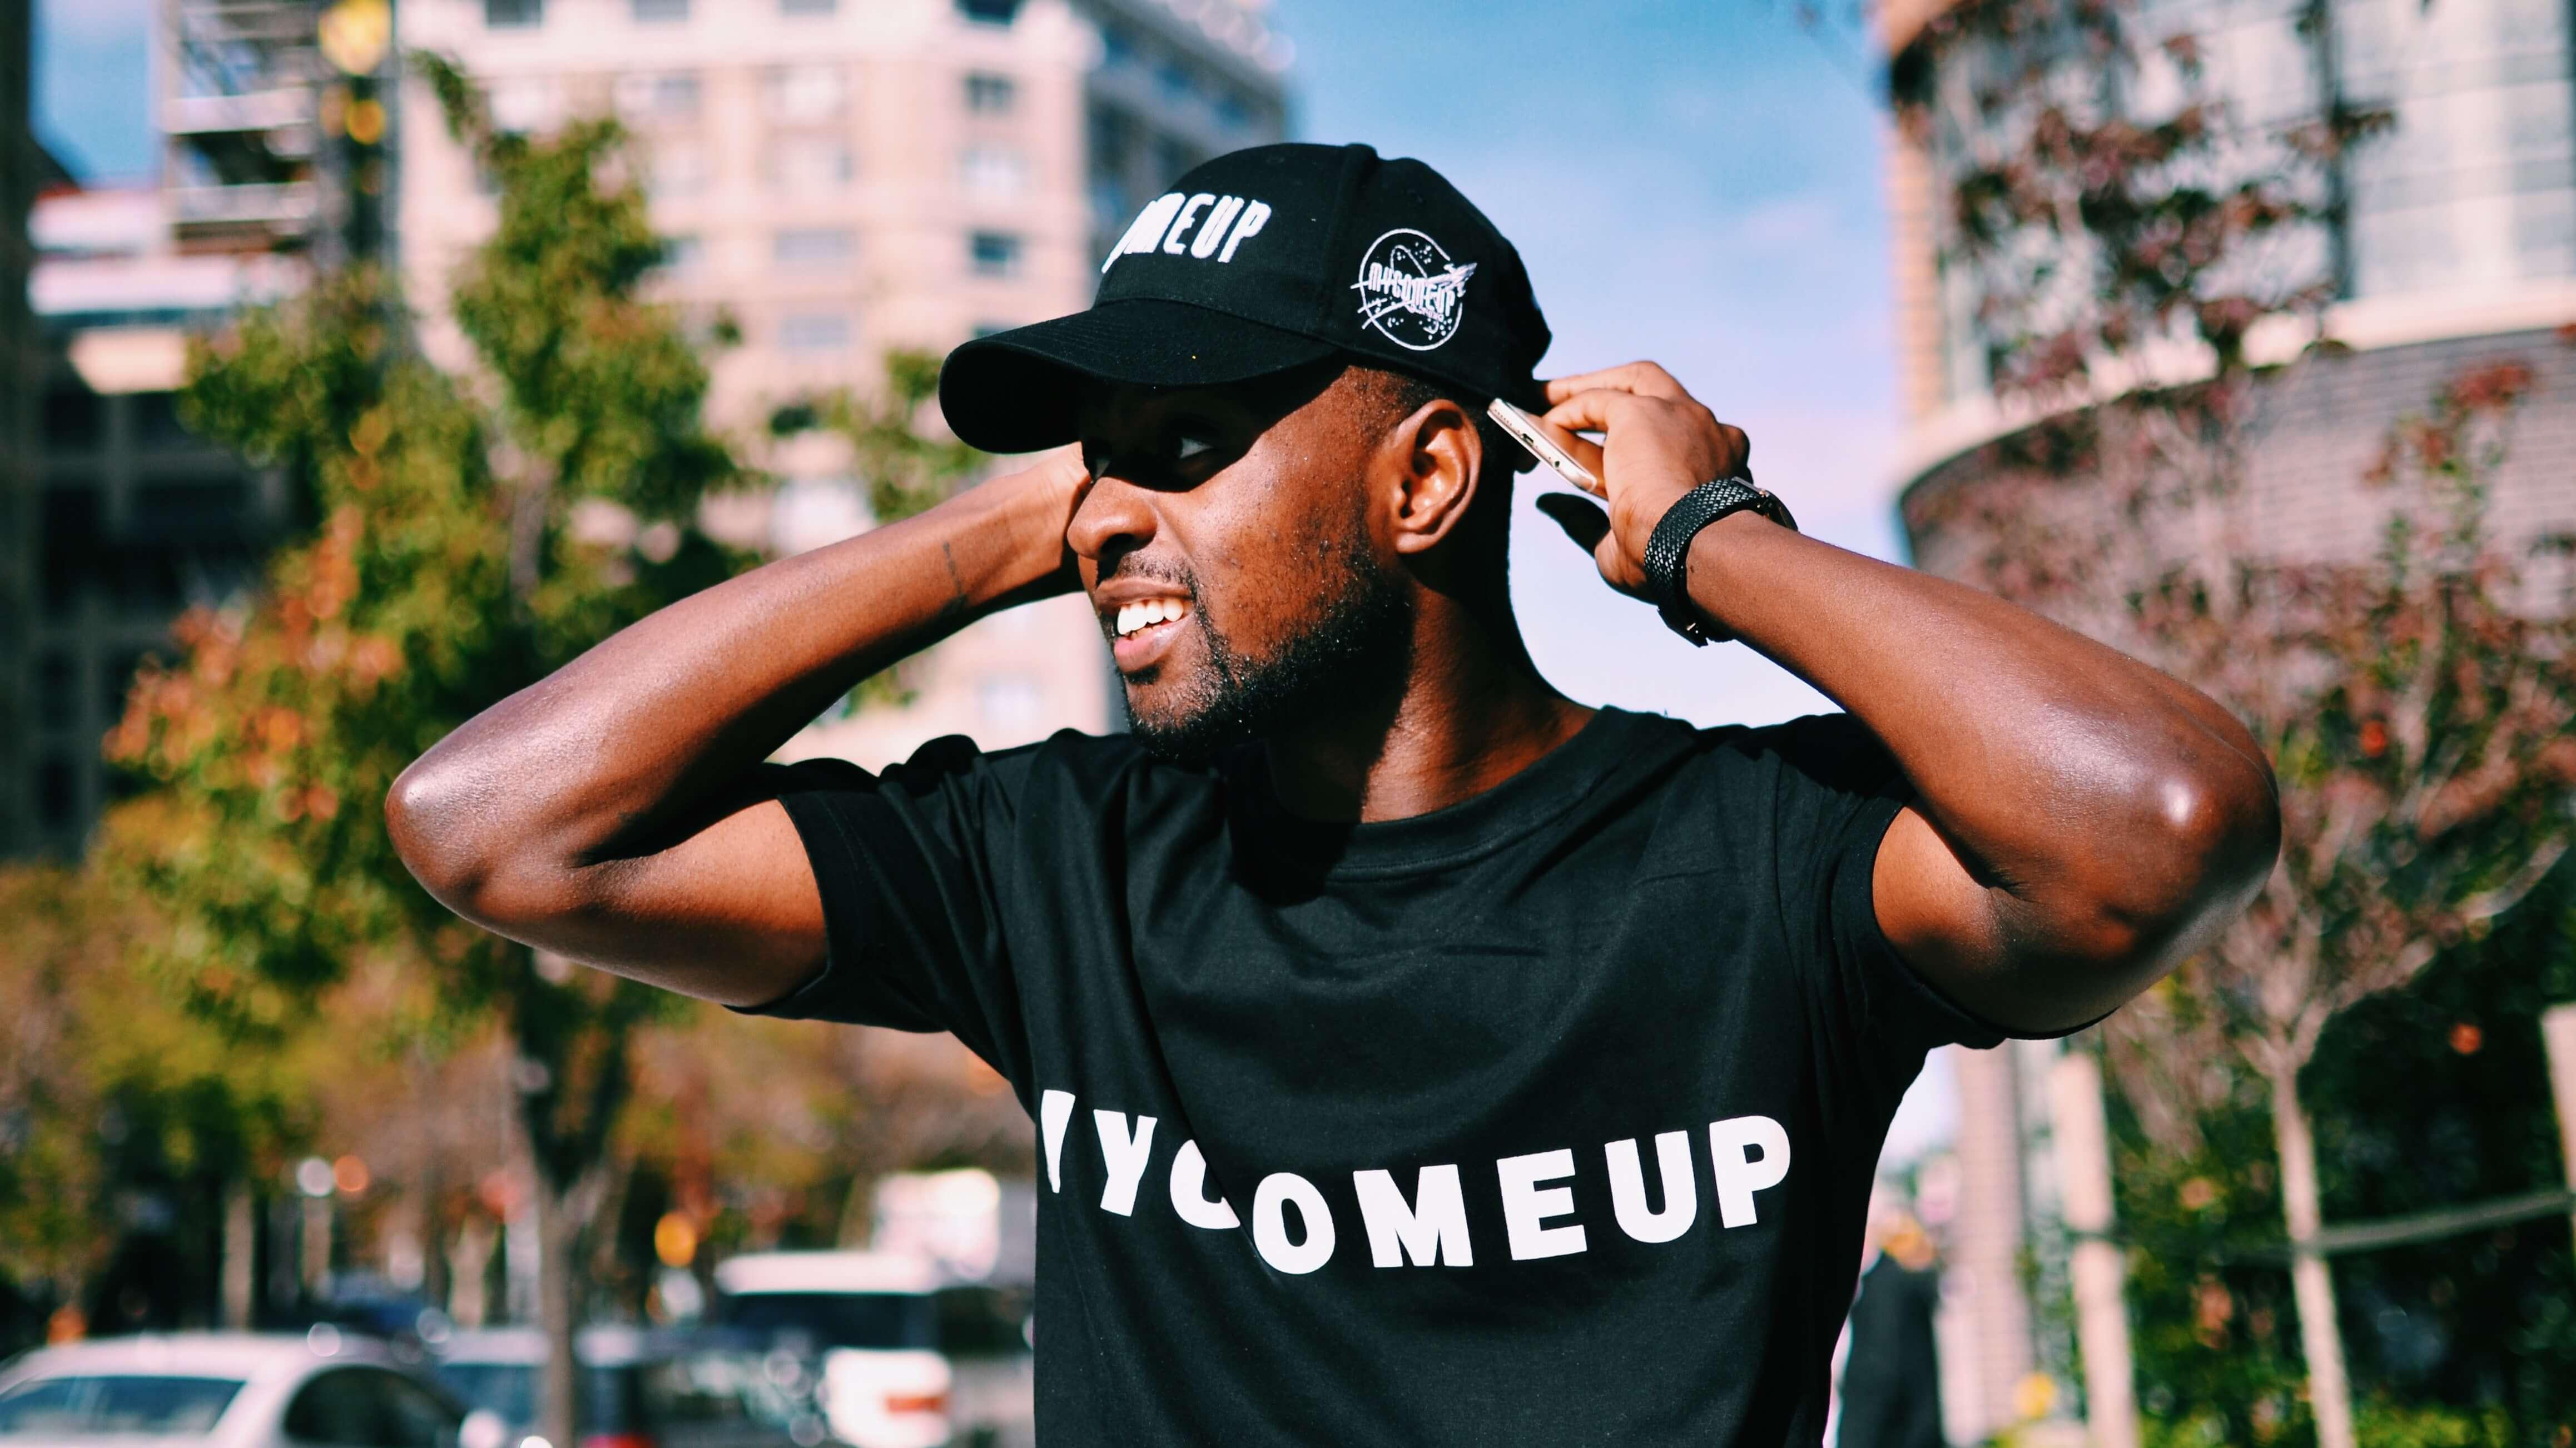 Community Service: Leonard Sekyonda's MyComeUp World